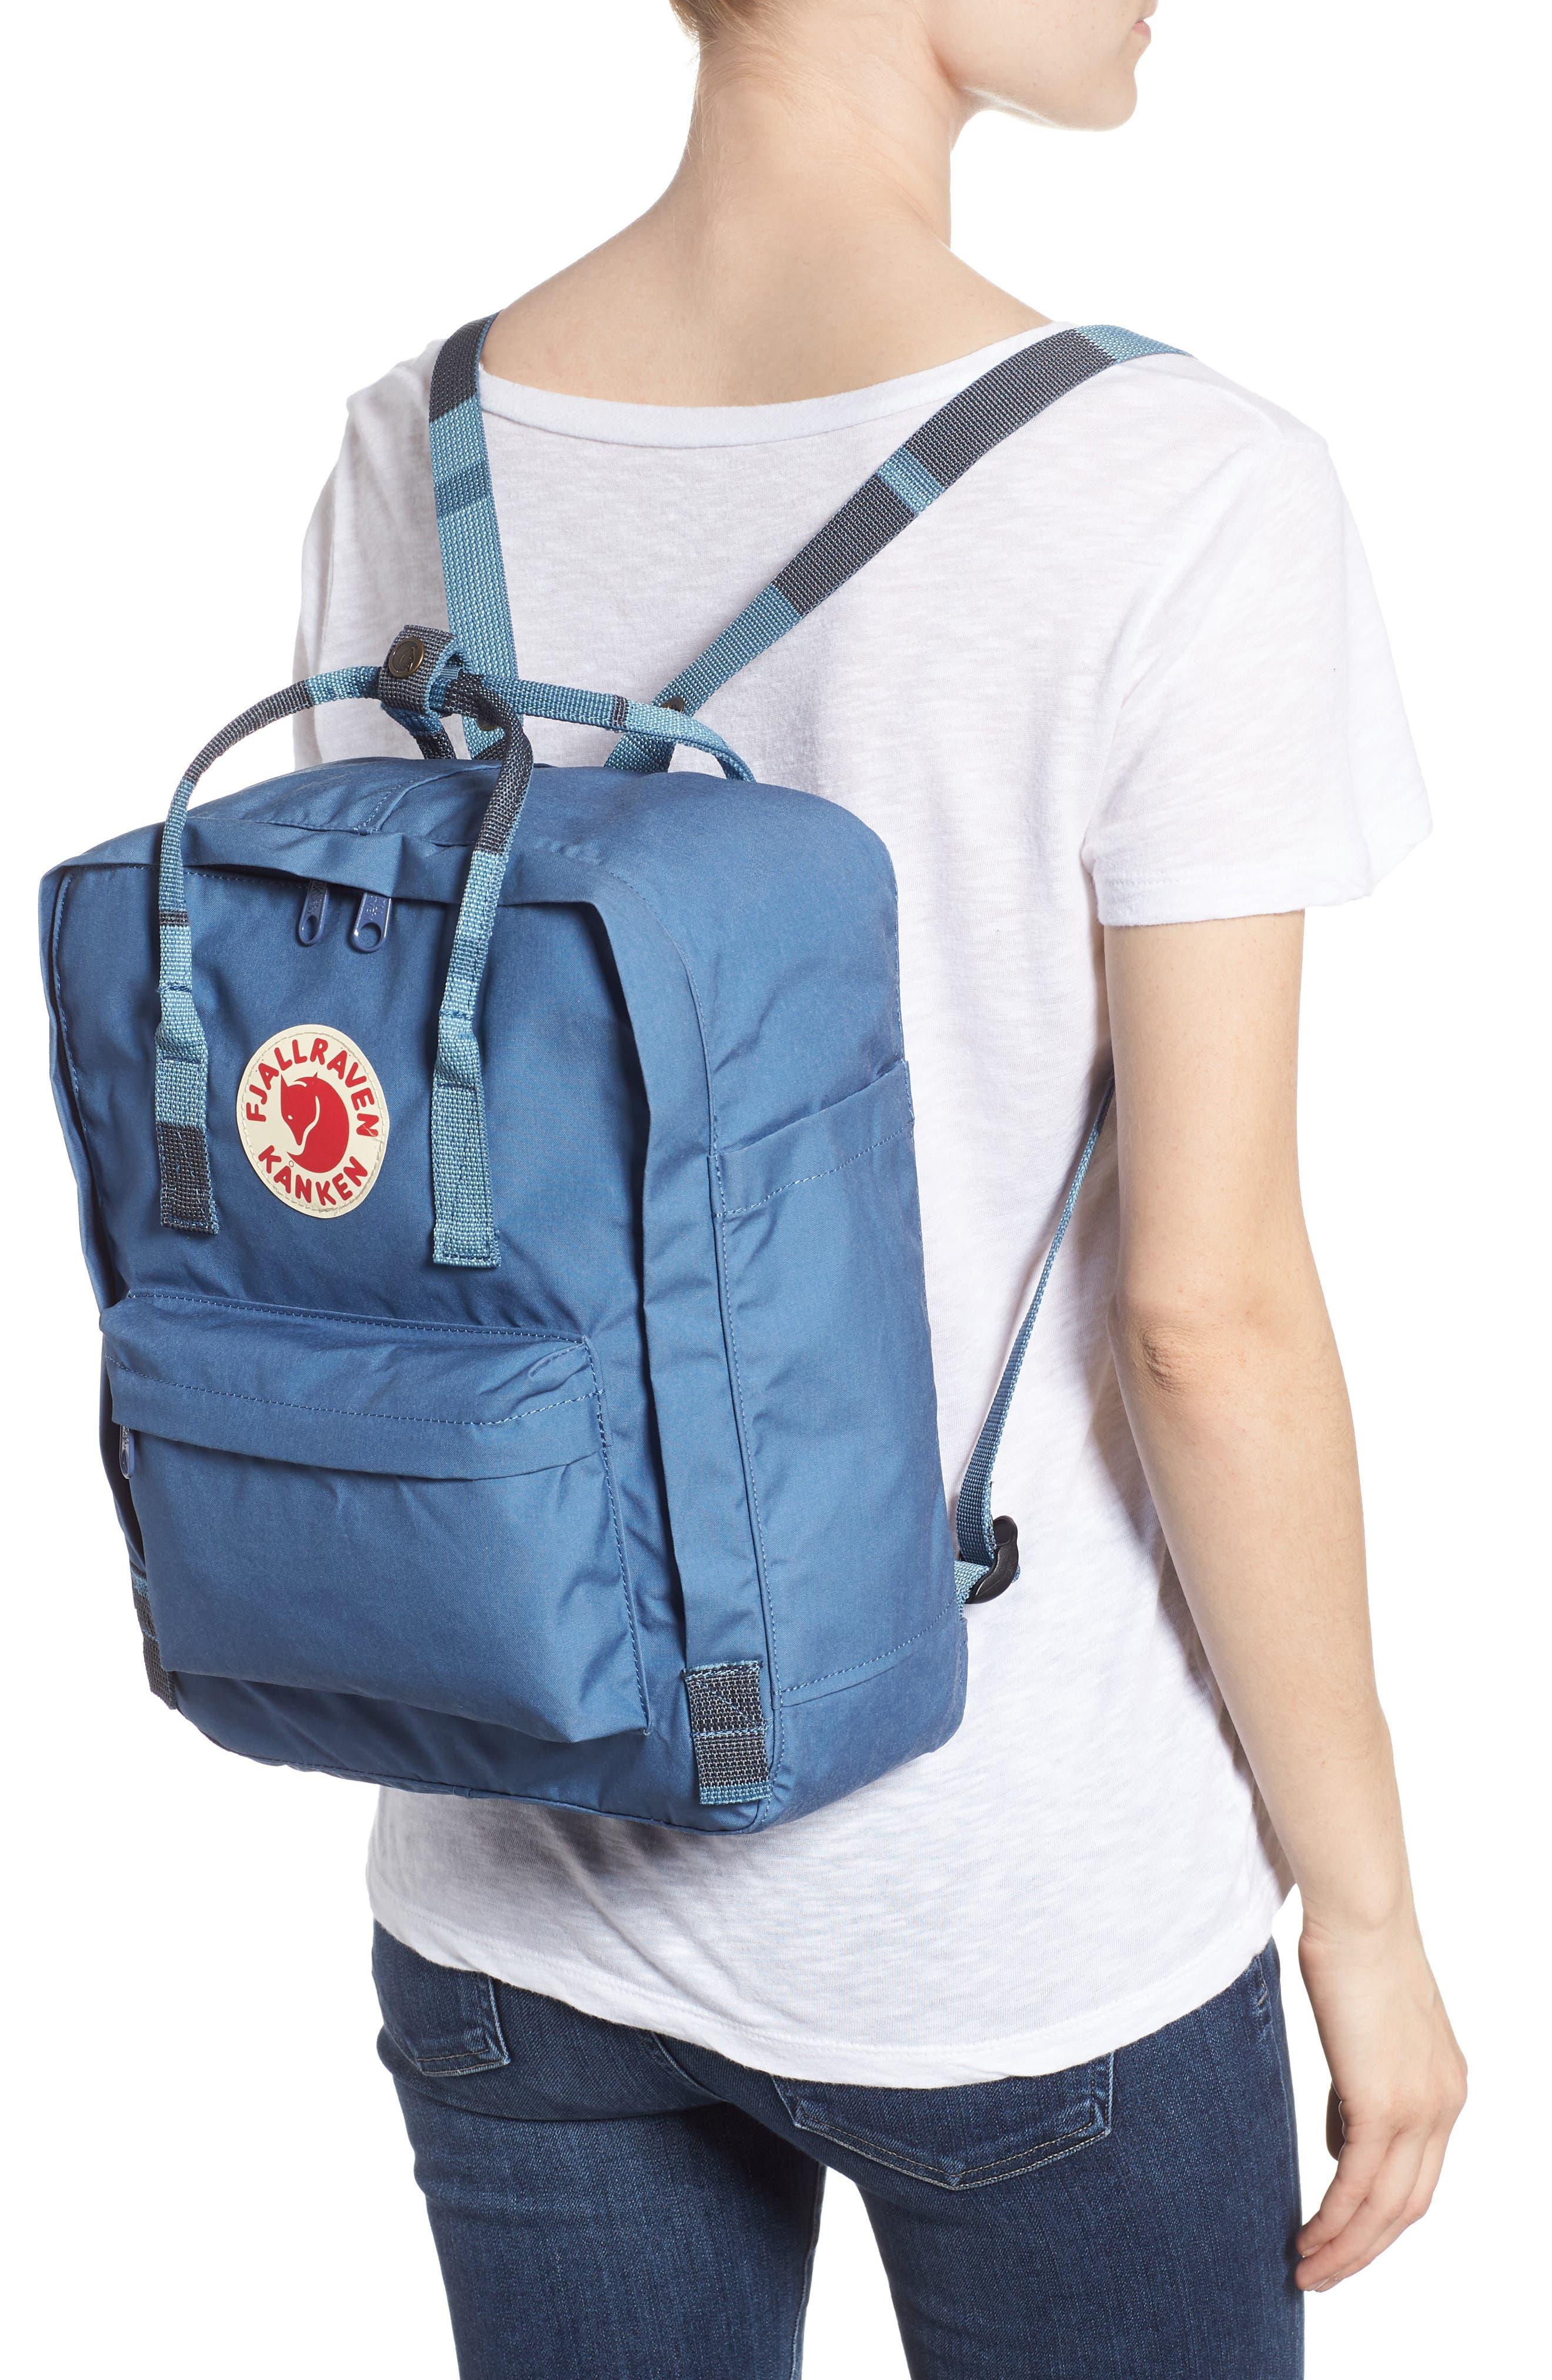 'Kånken' Water Resistant Backpack,                             Alternate thumbnail 2, color,                             Blue Ridge/ Random Blocked